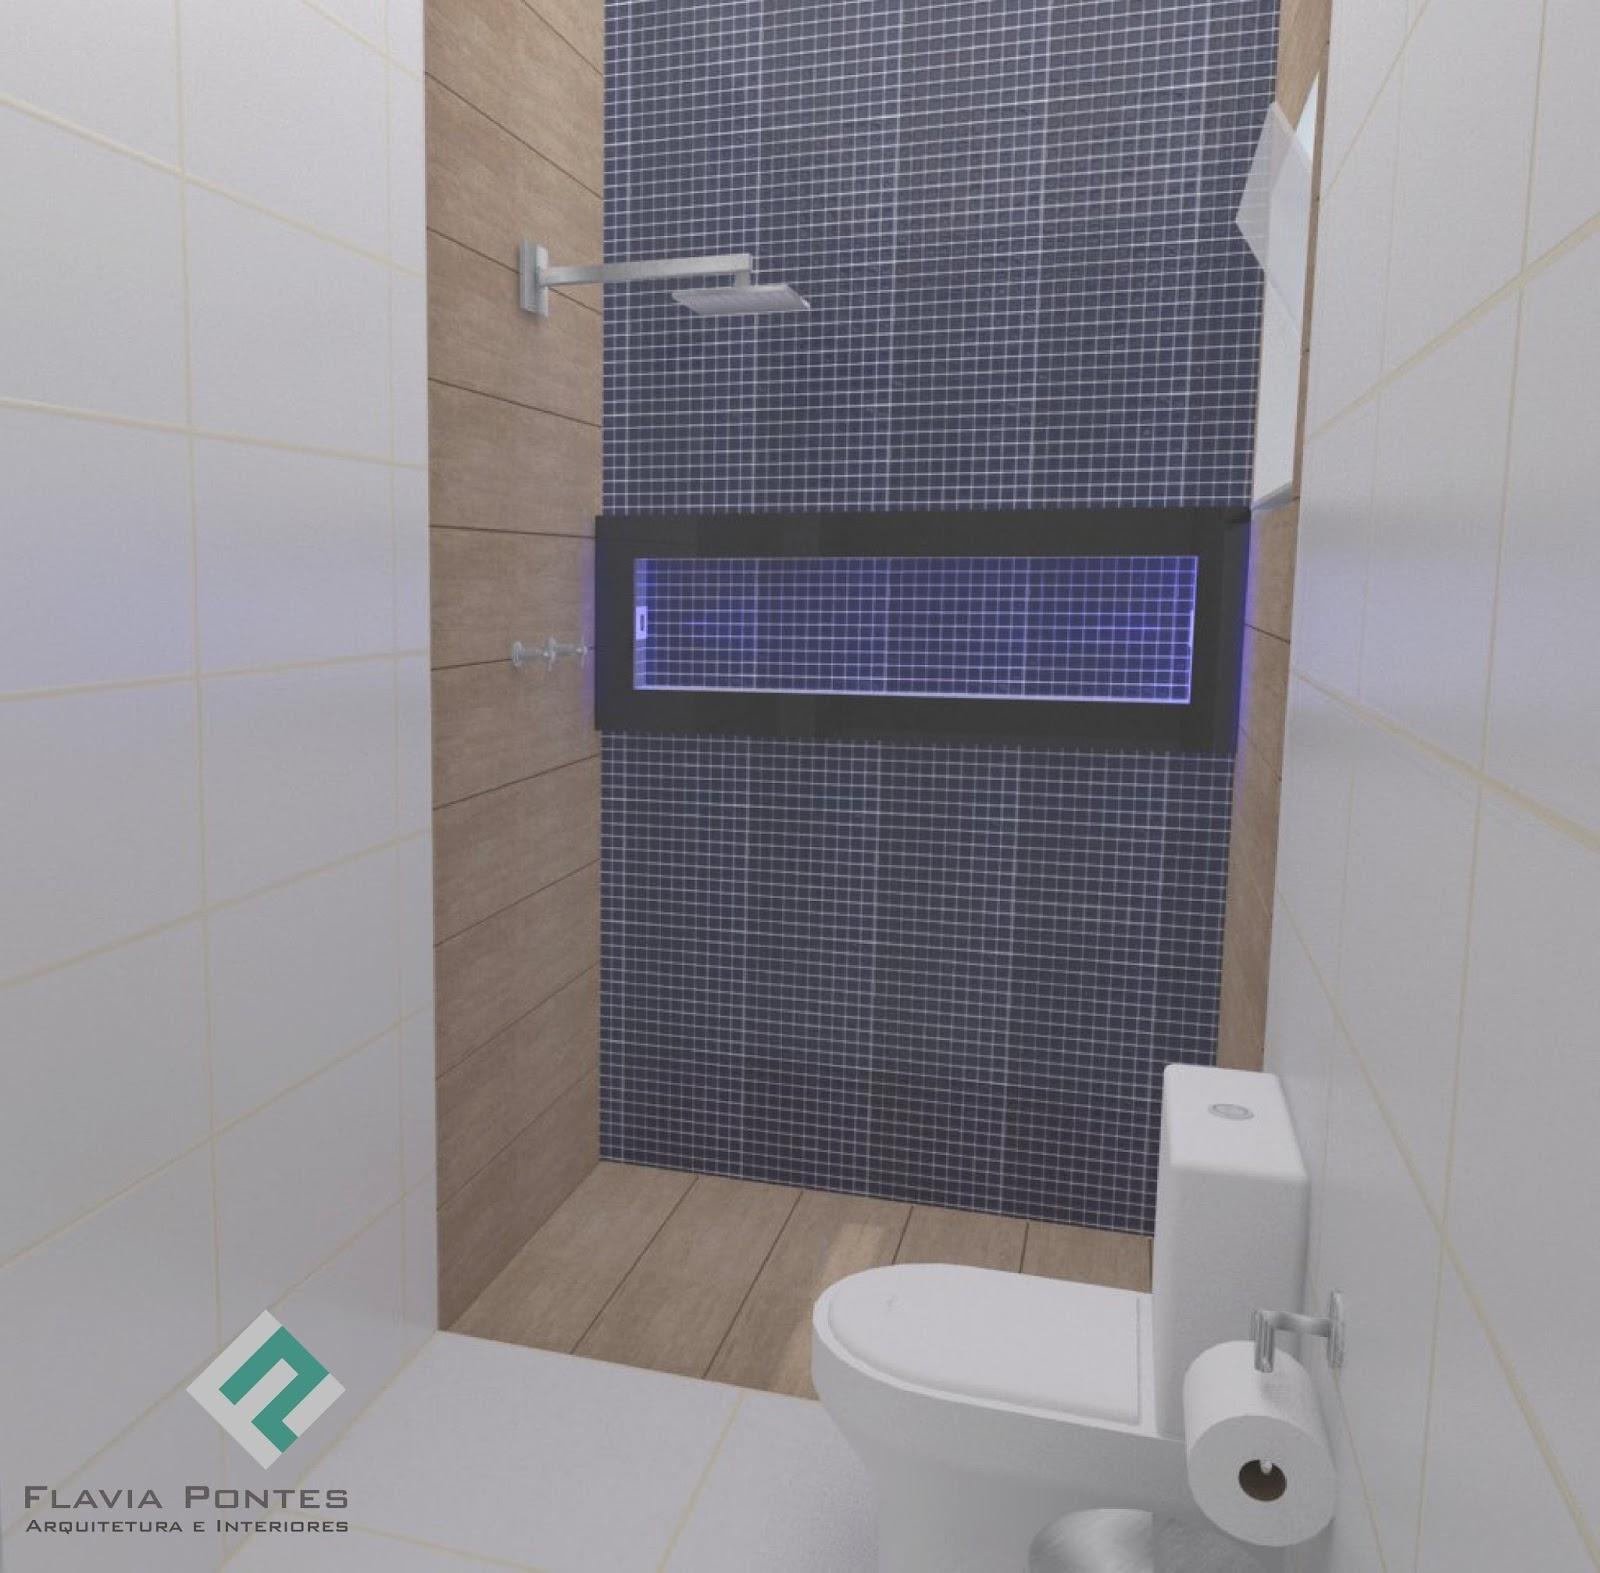 Banheiro piso escuro : Piso escuro para banheiro shinny bea oem chins xmm azul